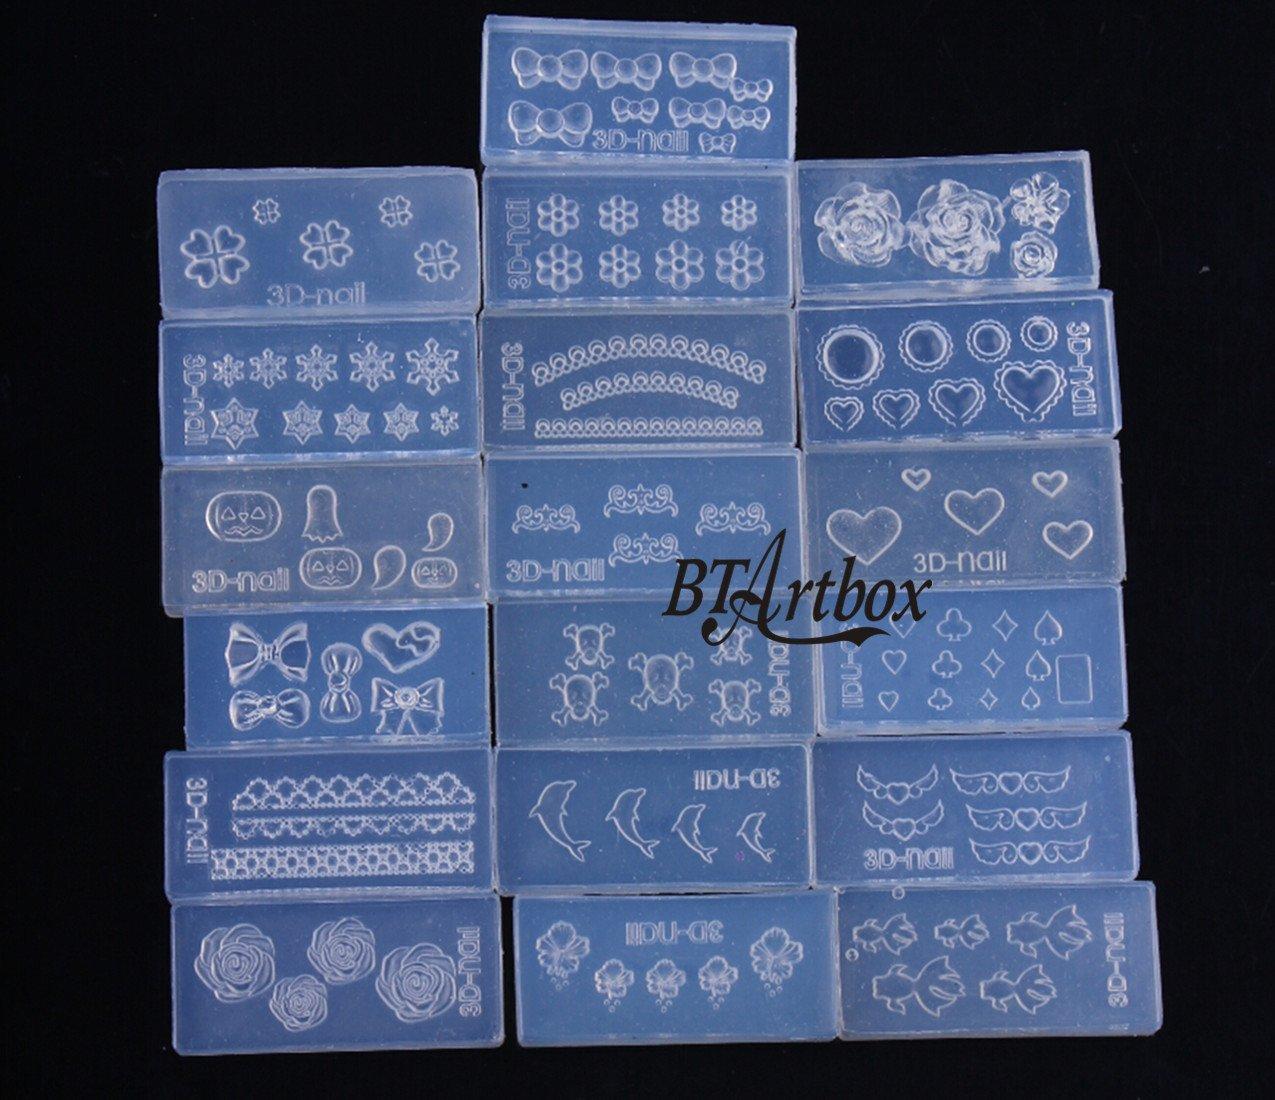 BTArtbox Random Style 6 pcs 3D Acrylic Nail Art Mold DIY Nail Art Design Silicone Carving Template Mold